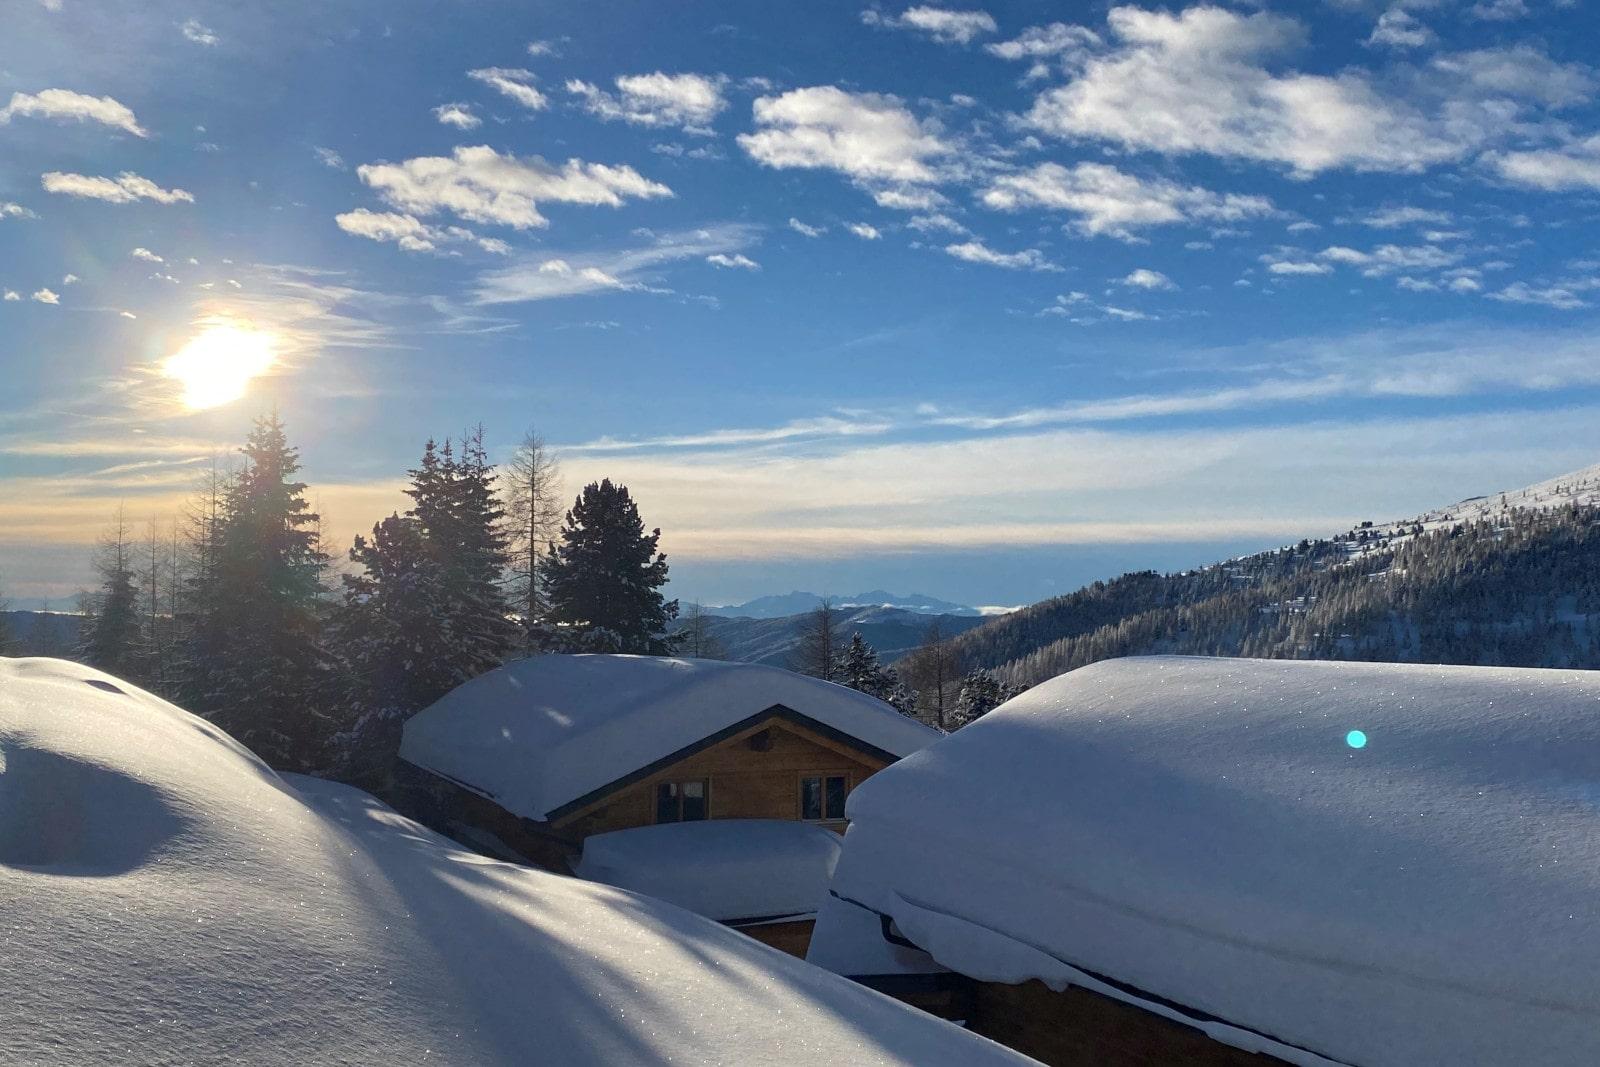 Heidi-Chalet-Falkert-Heidialm-Bergwinter-Wolken-Himmel-Stimmung-Traum